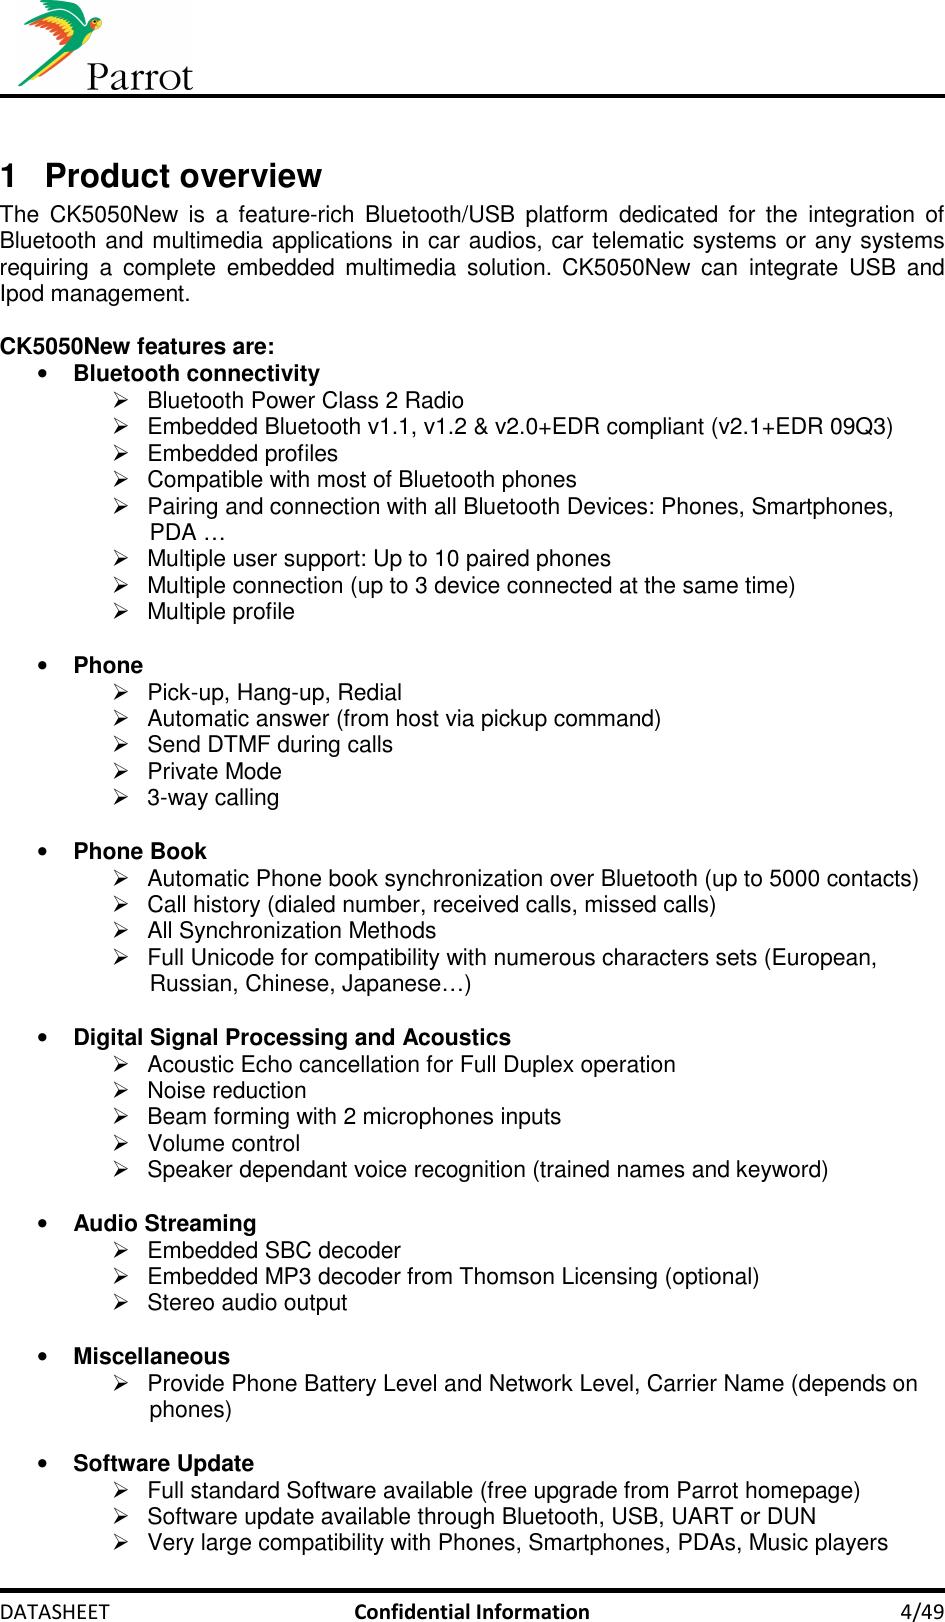 PARROT CK5050NEW Bluetooth Car Multimedia Module User Manual